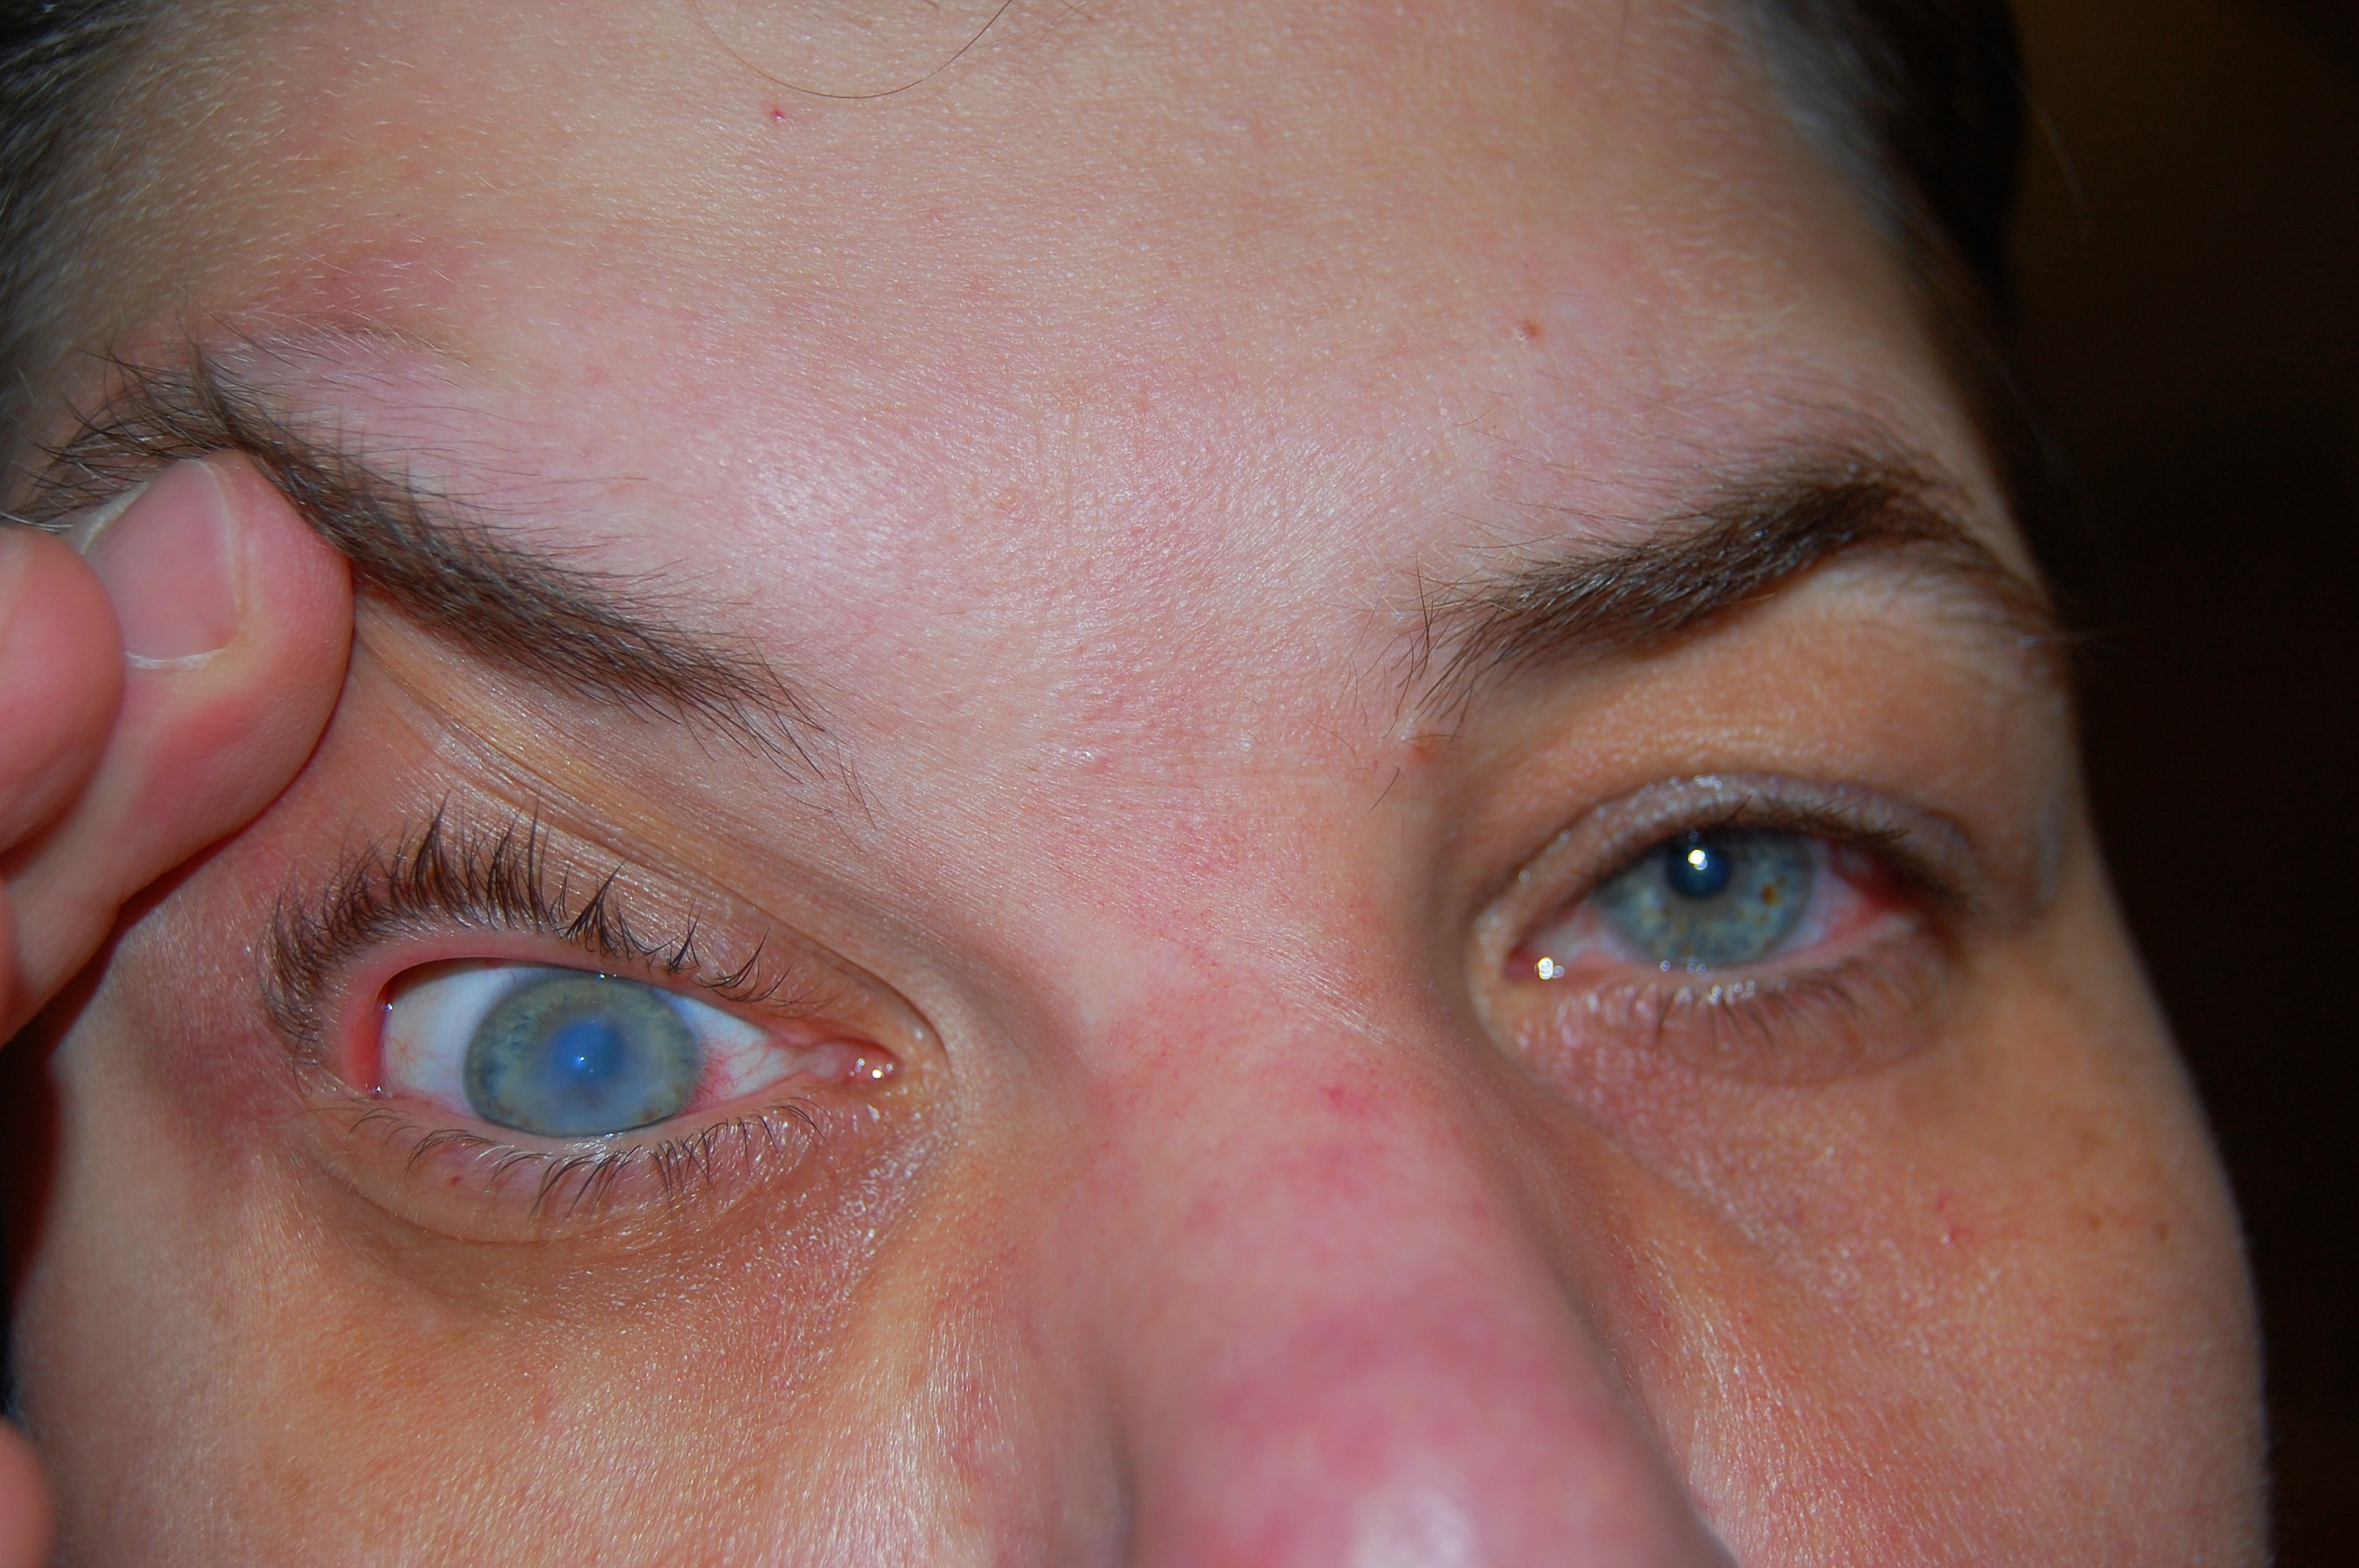 Keratoconus Eye Disease